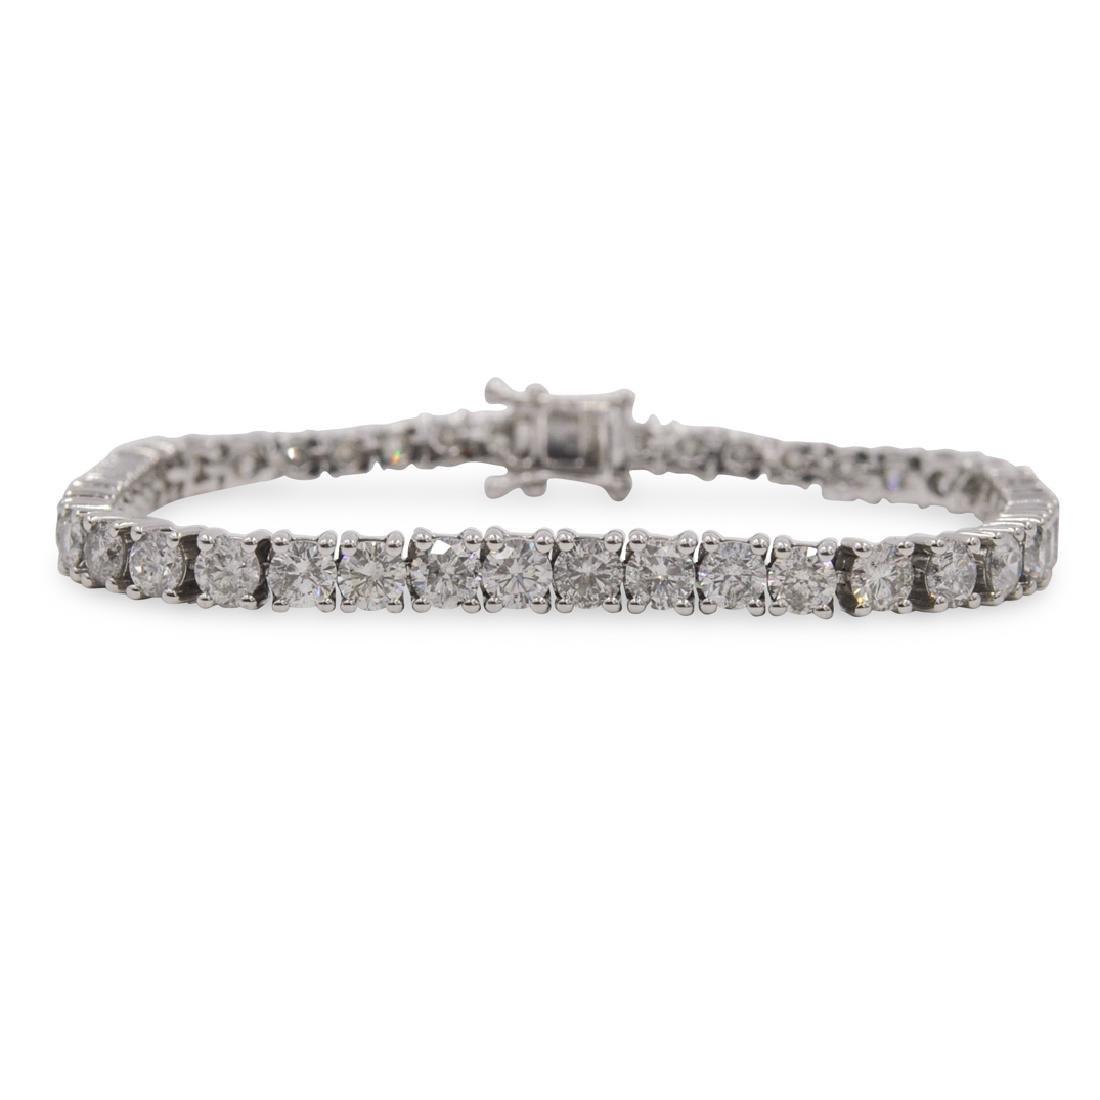 14k Gold and Diamond Tennis Bracelet